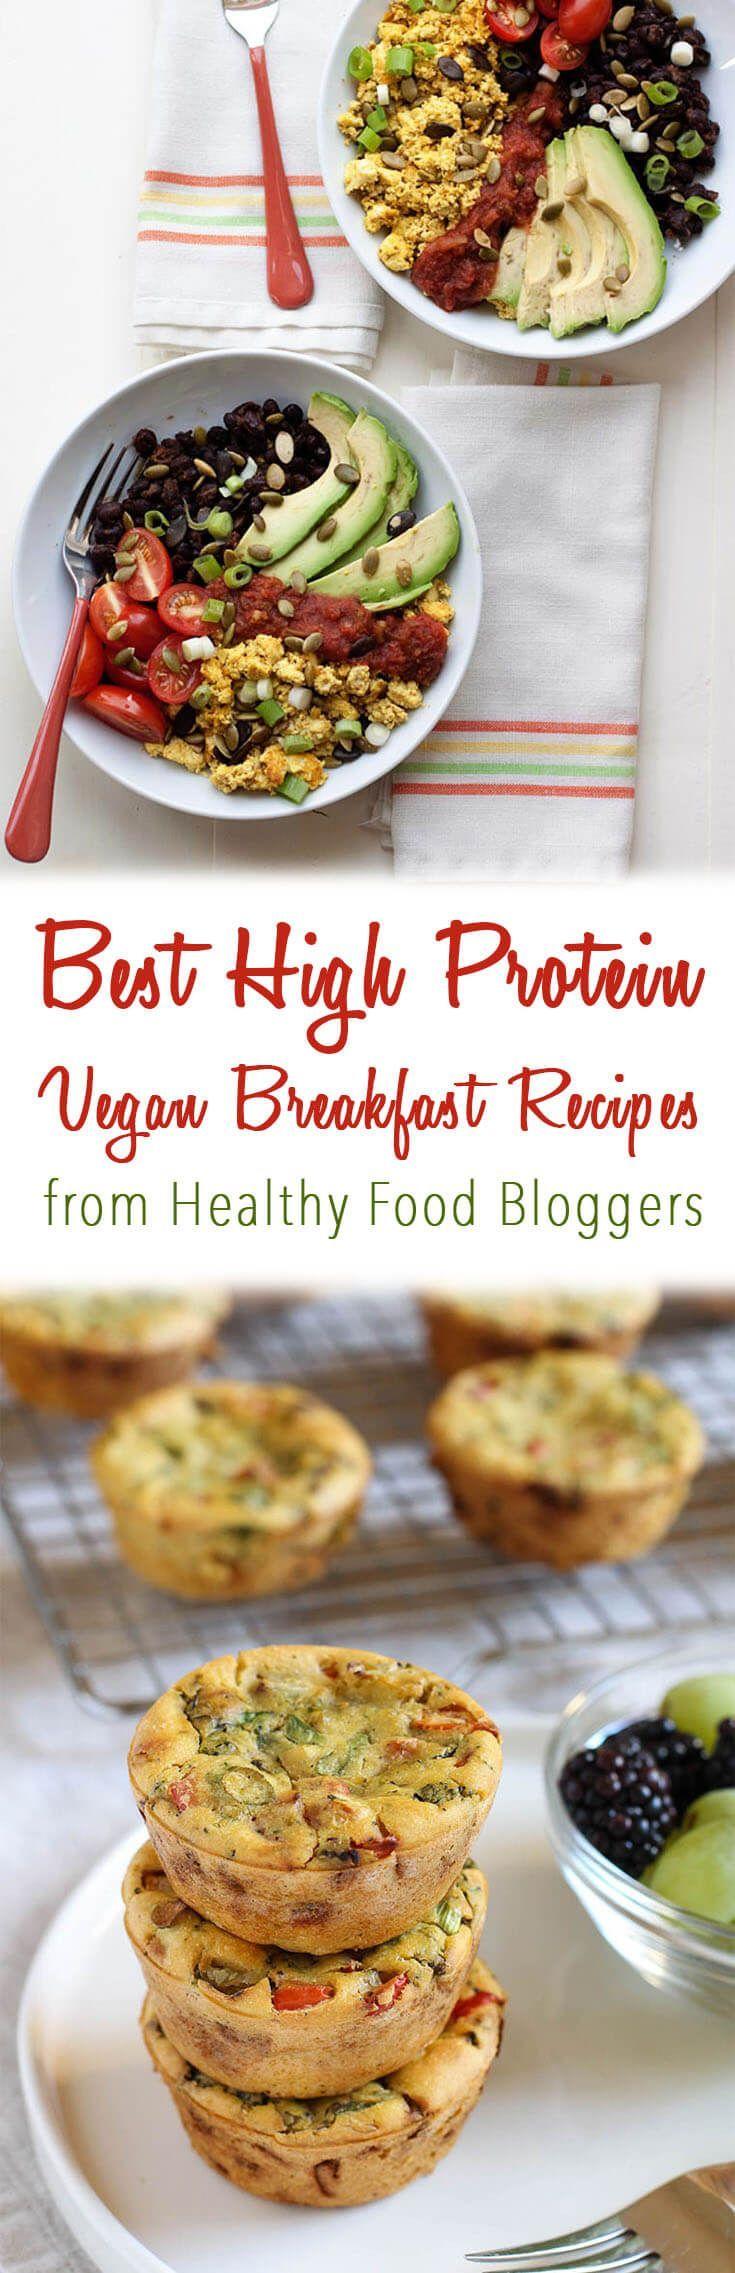 HealthyFood on High protein vegan breakfast, Vegan